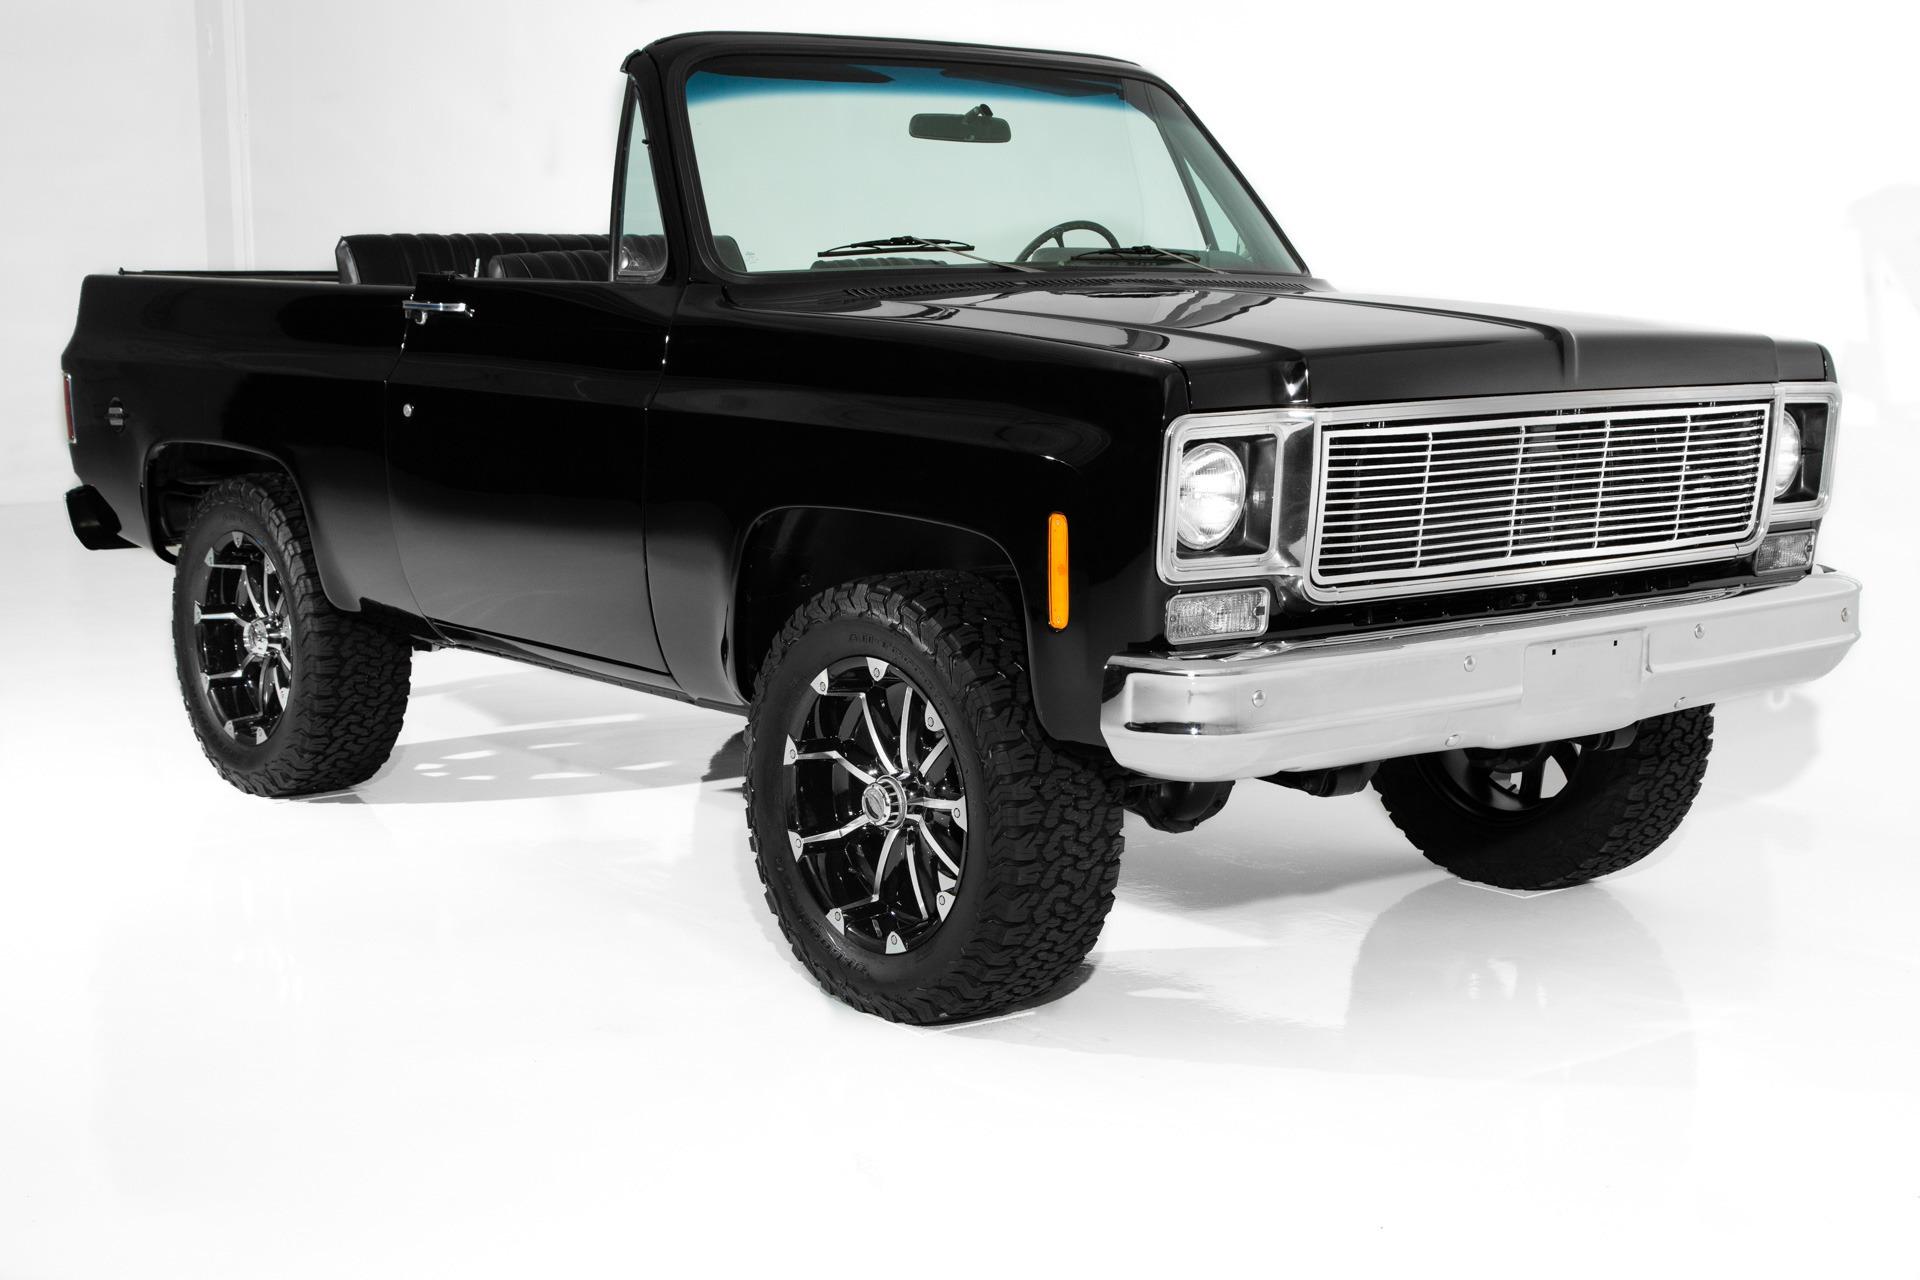 Photo 1975 Chevrolet Blazer Black K5 Auto 4X4 20s